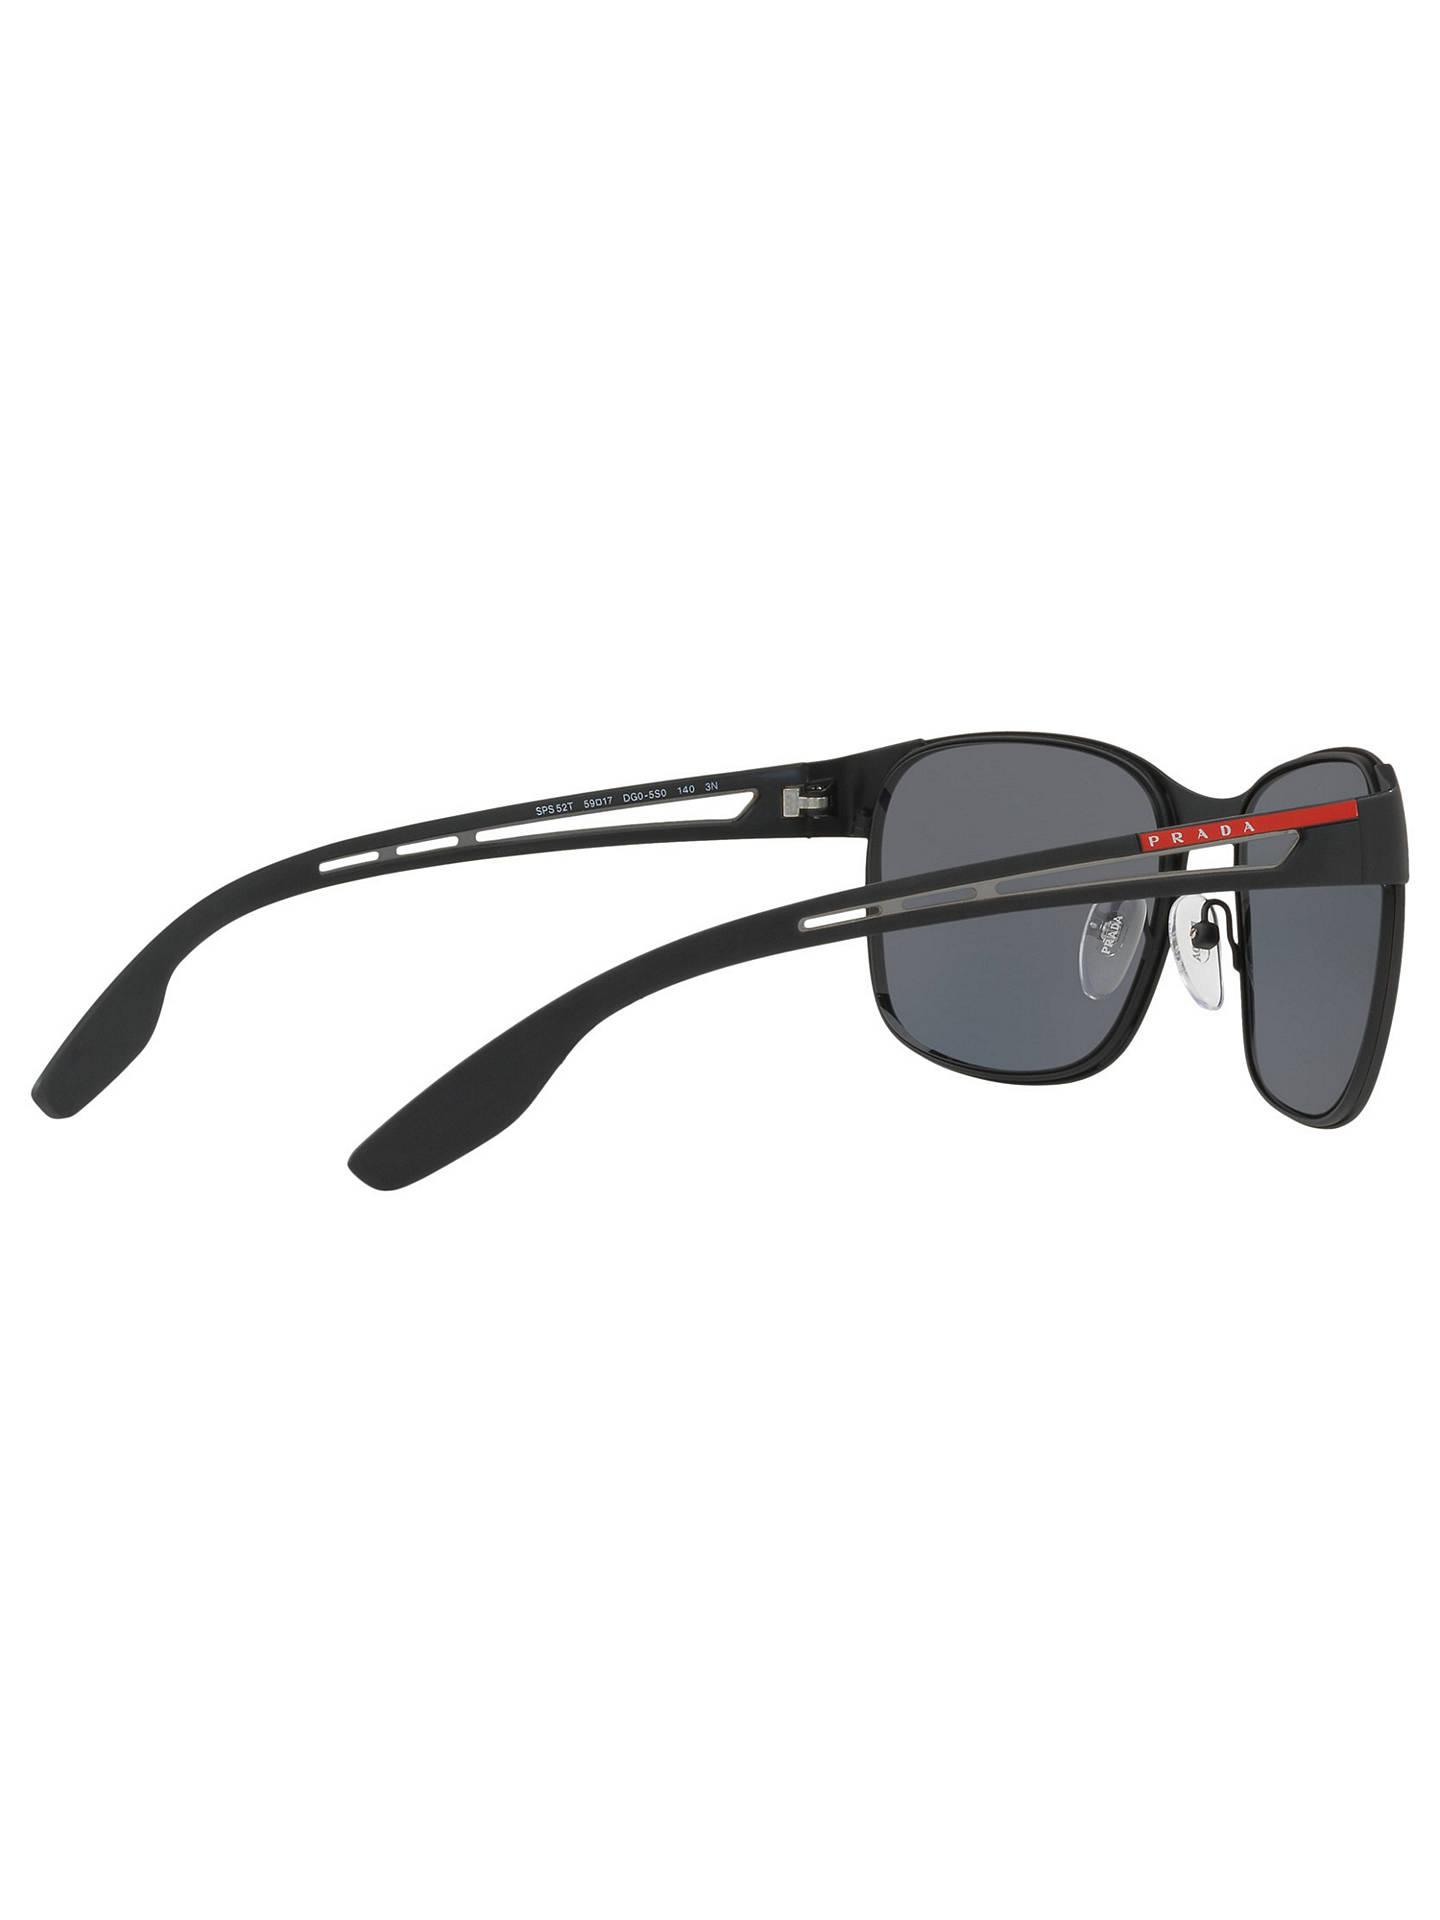 fbfcb77850d6 ... Buy Prada Linea Rossa PS 52TS Men s Square Sunglasses